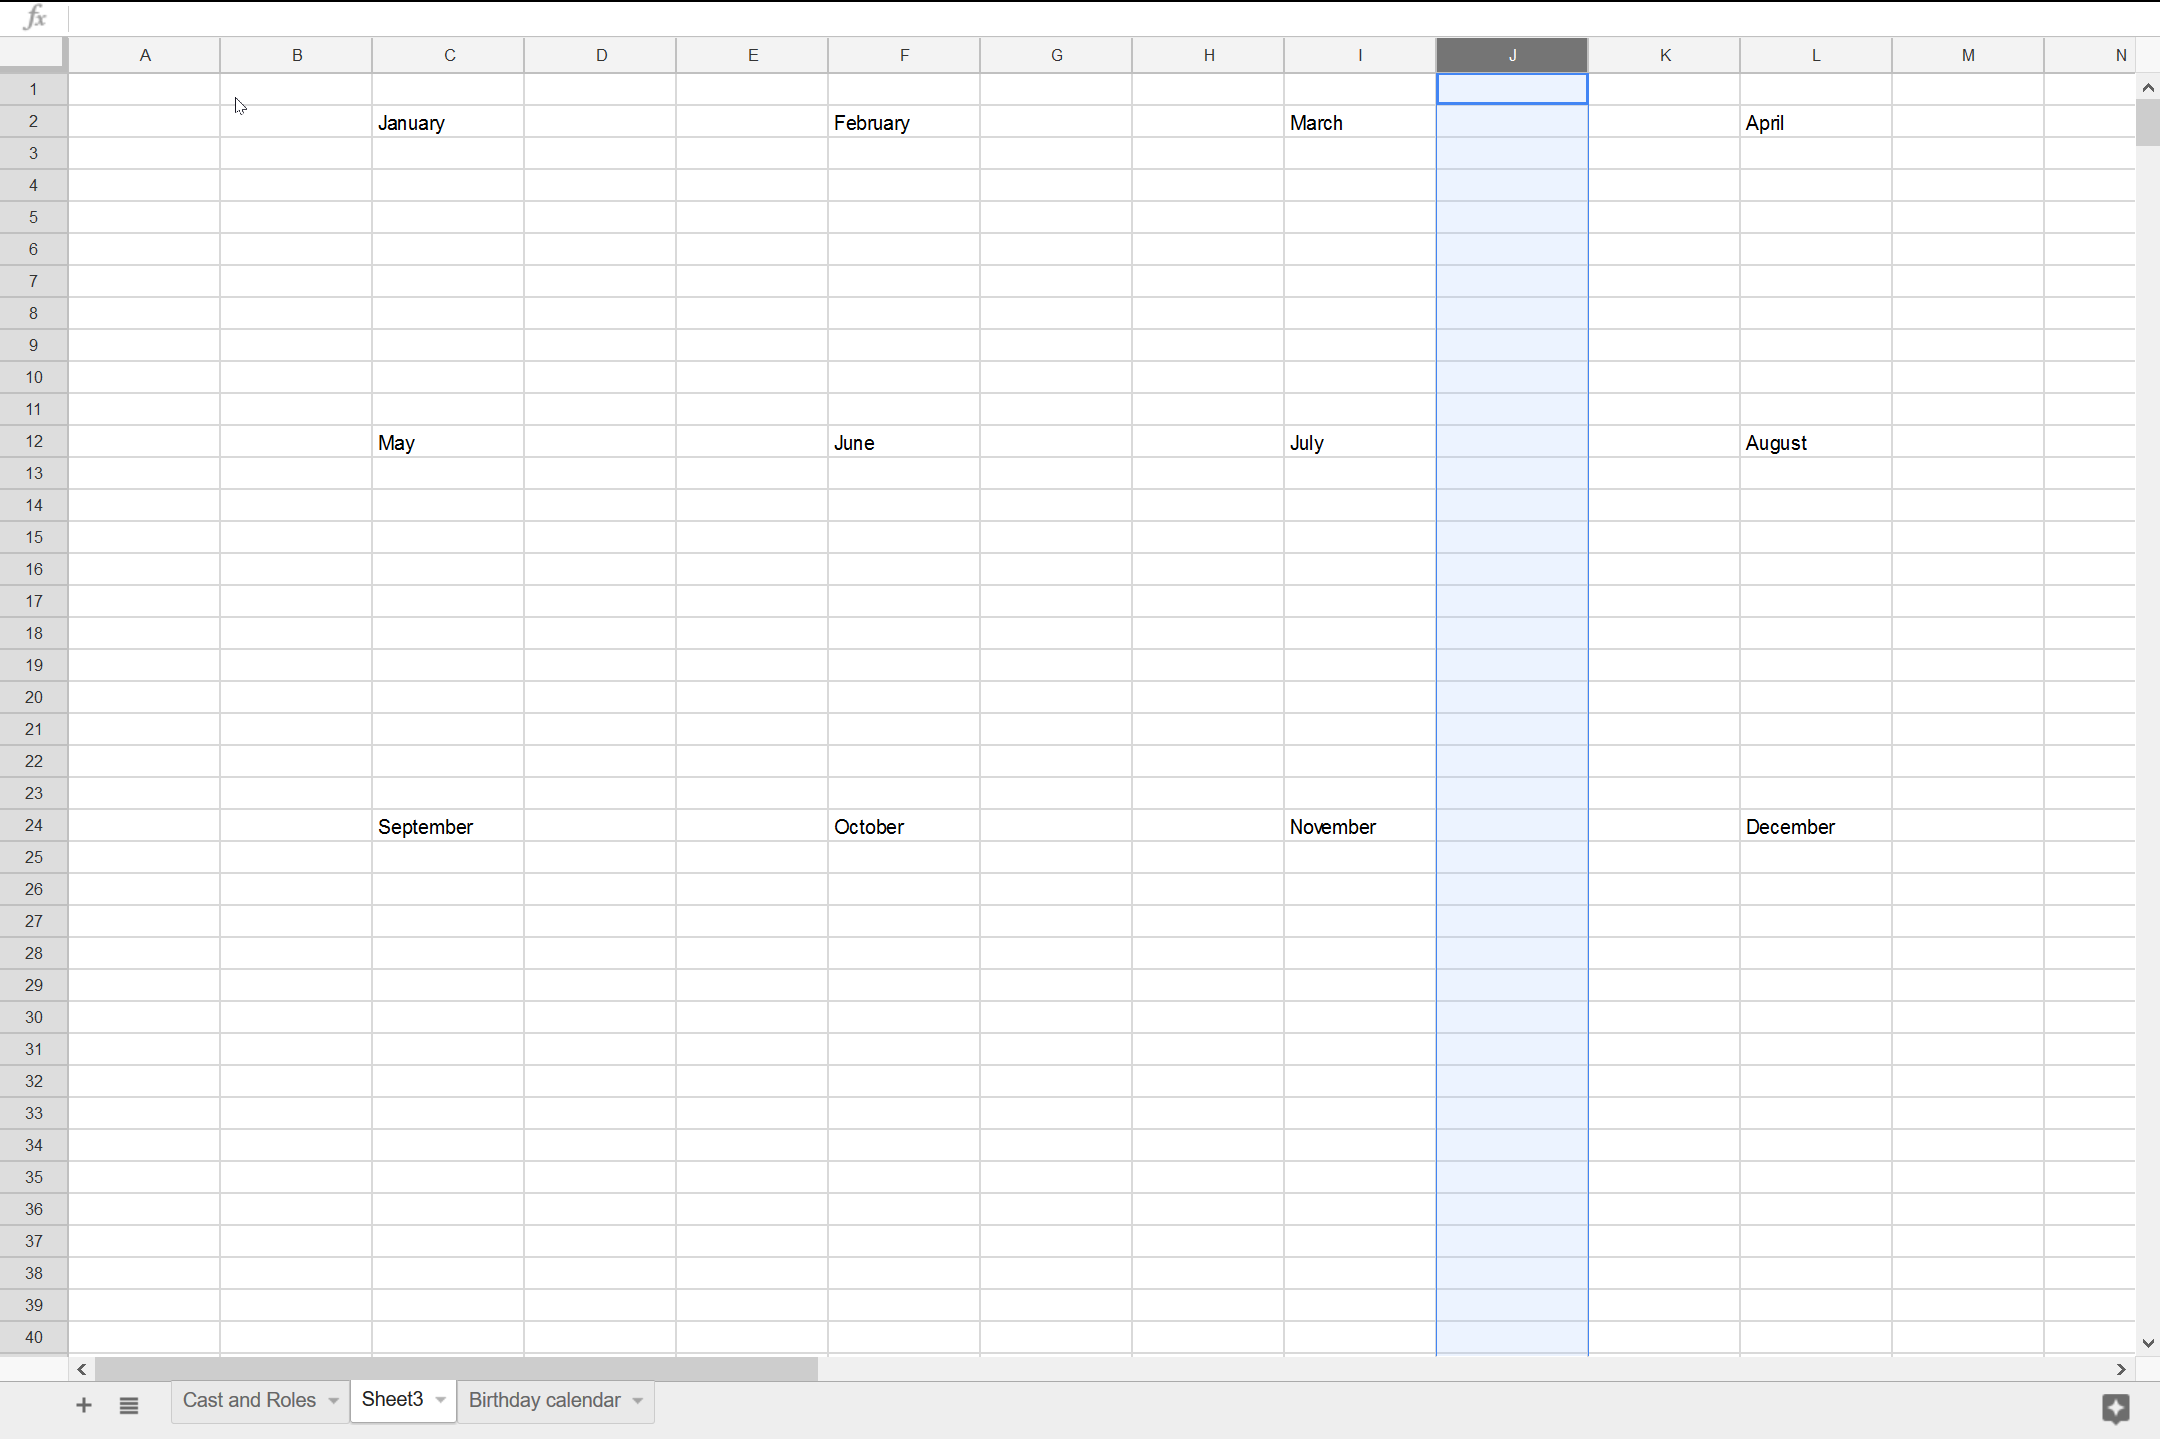 Building the Calendar - 05